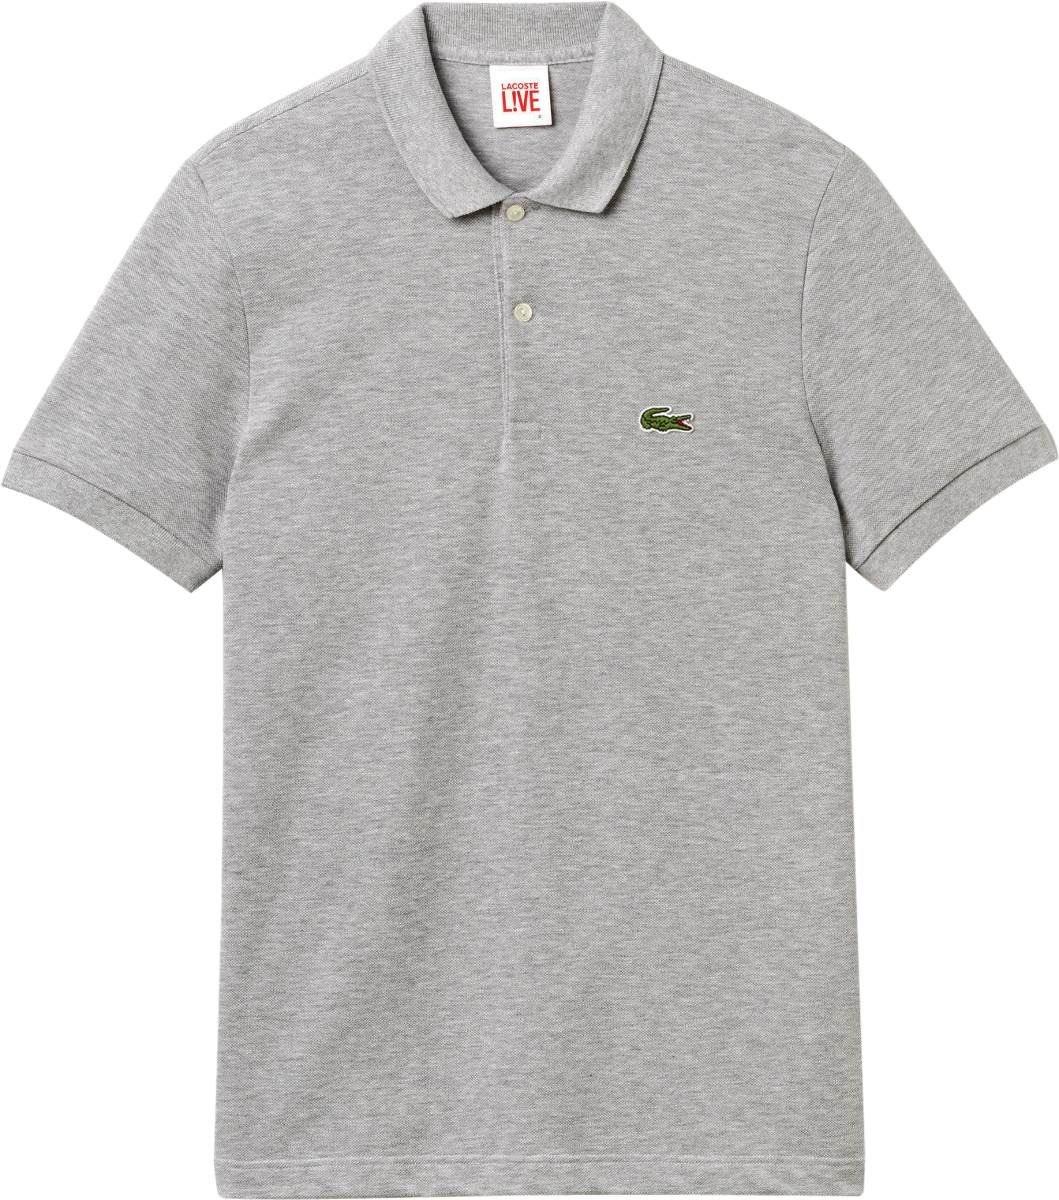 b7bb83bfc7b20 camisa polo lacoste cinza originais masculino manga curta. Carregando zoom.